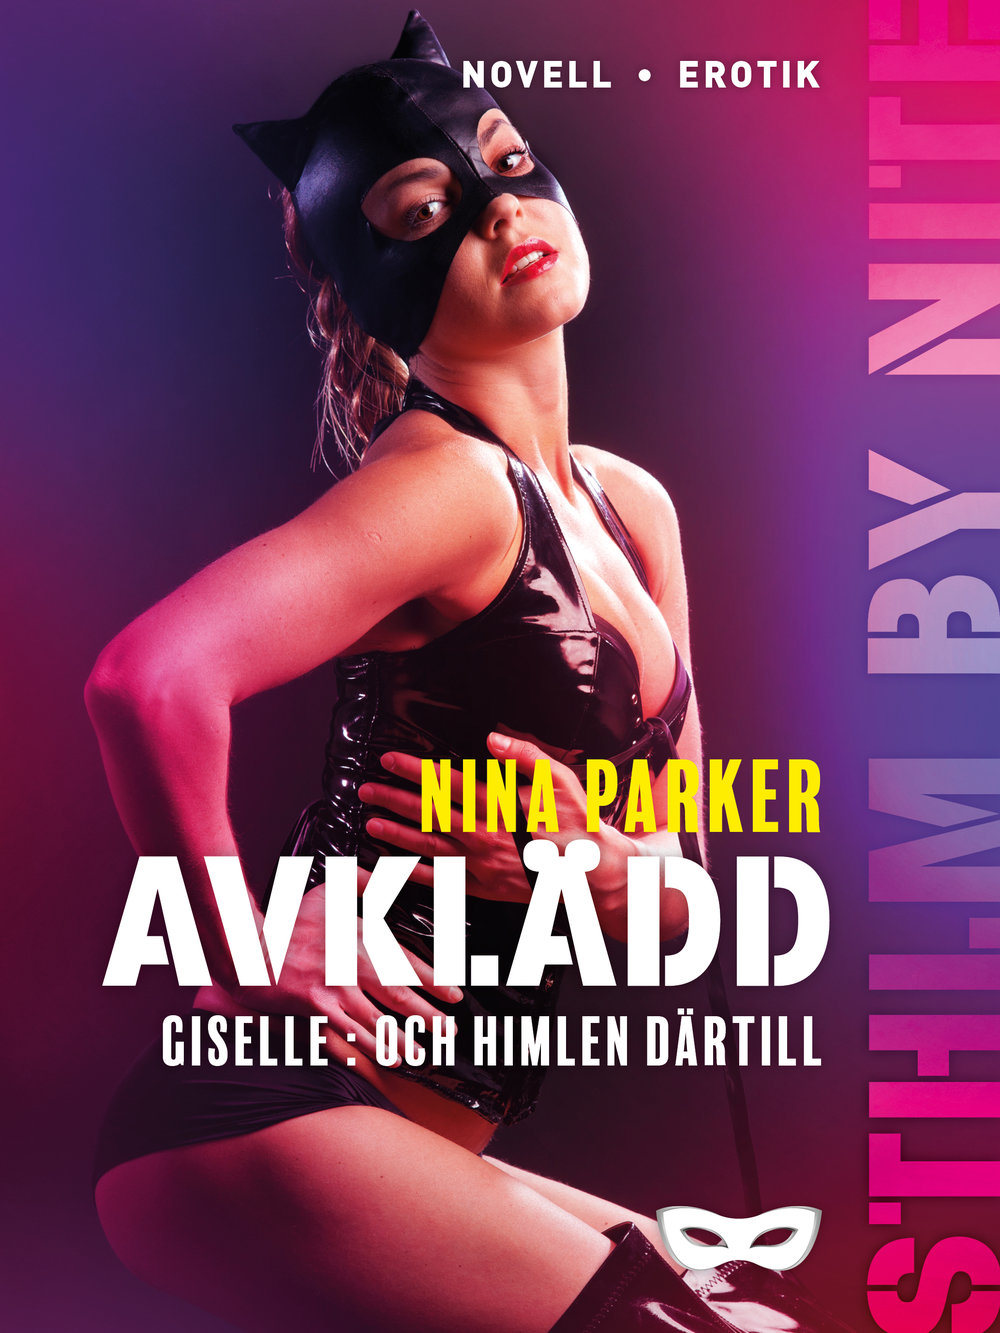 AVK-n_Avkladd_Nina Parker.jpg